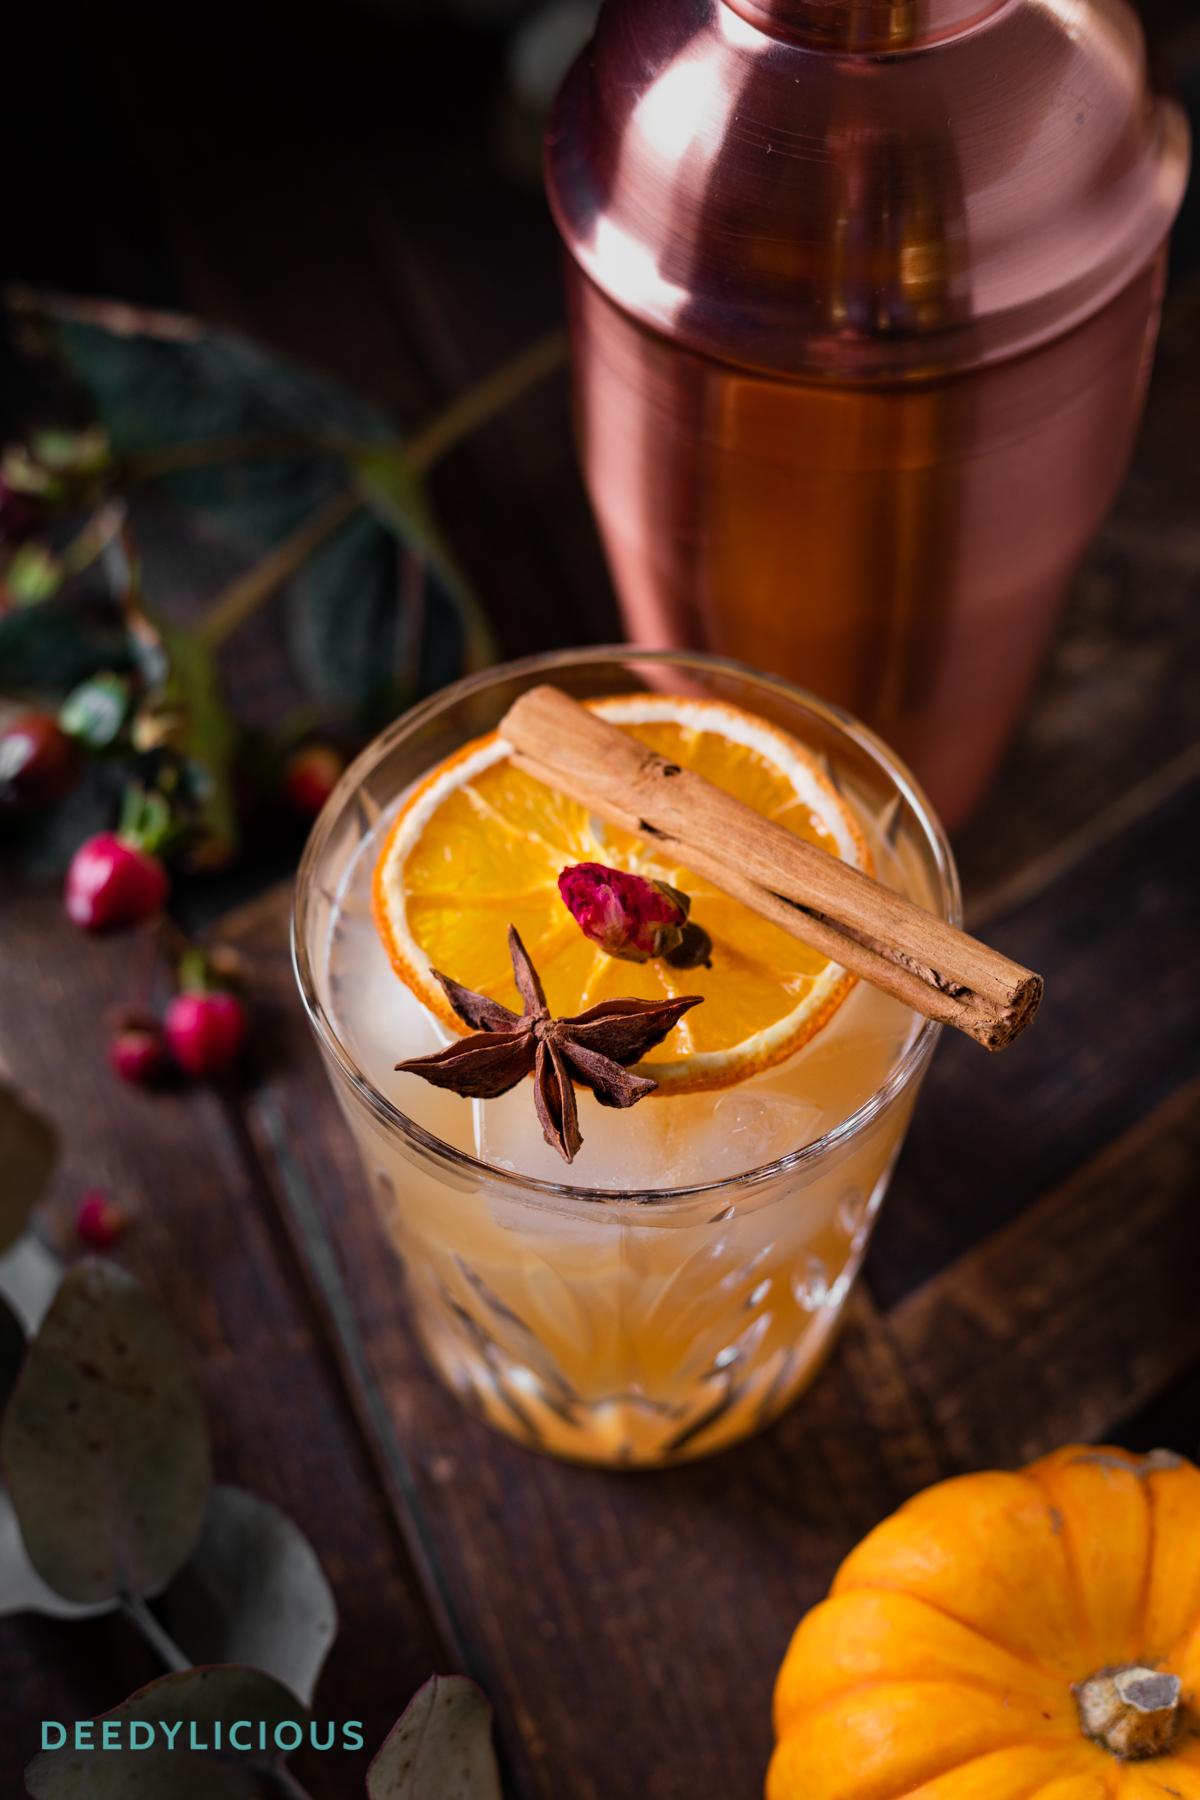 Glas met kruidige cocktail met kaneelstokje bovenop met shaker en takken in achtergrond